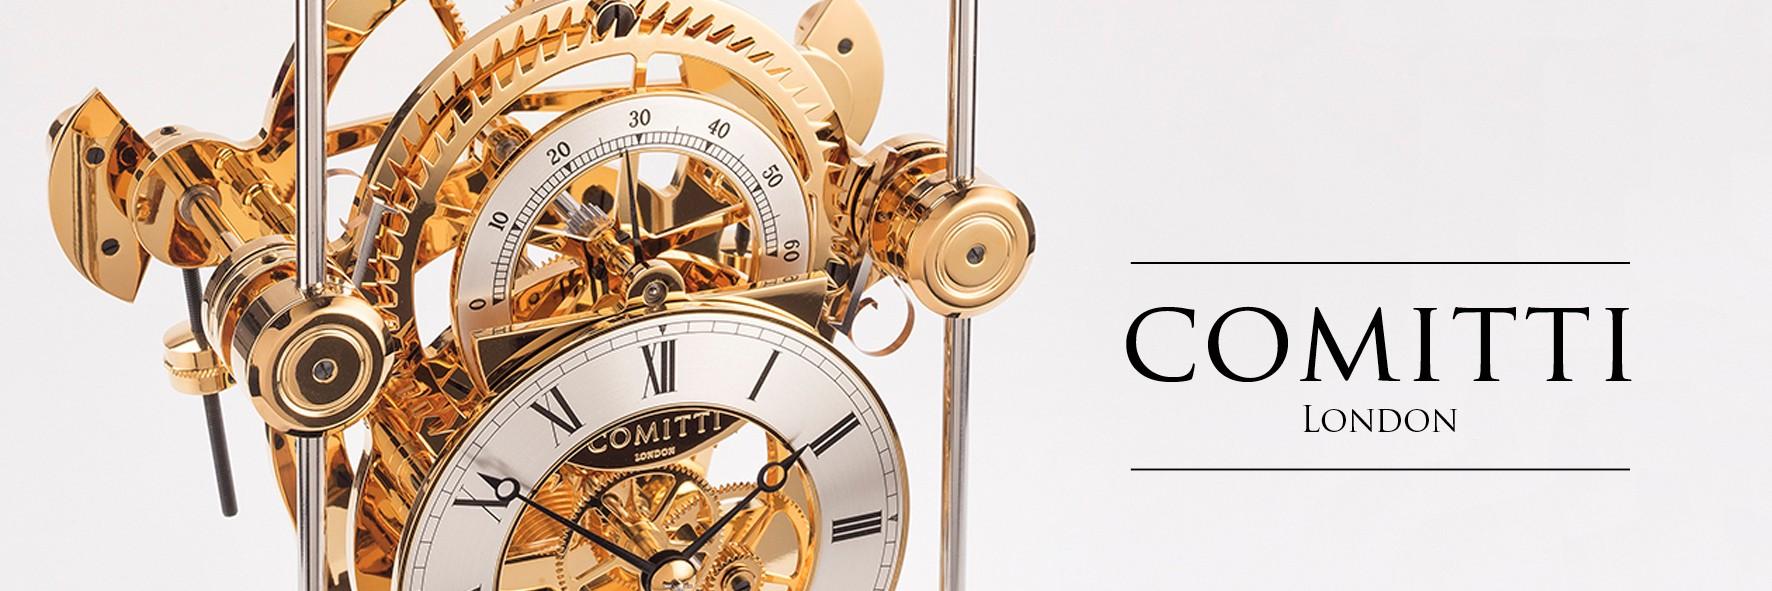 Comitti Clocks